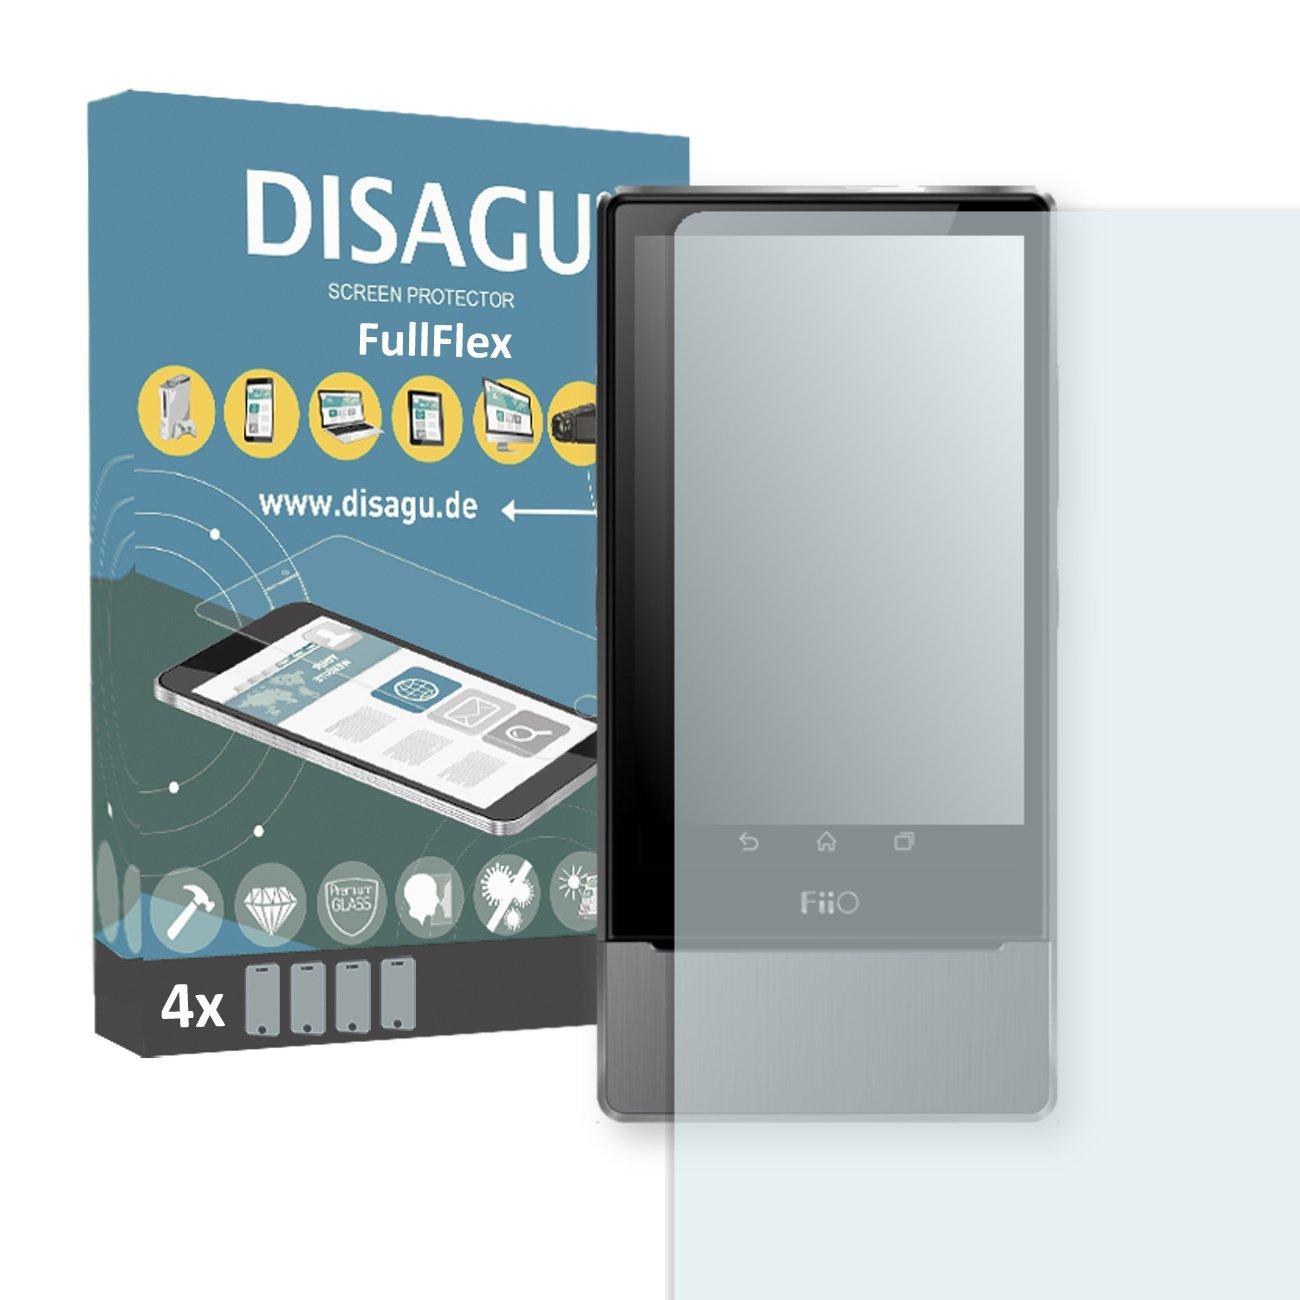 4 x Disagu FullFlex screen protector for FiiO X7 foil screen protector